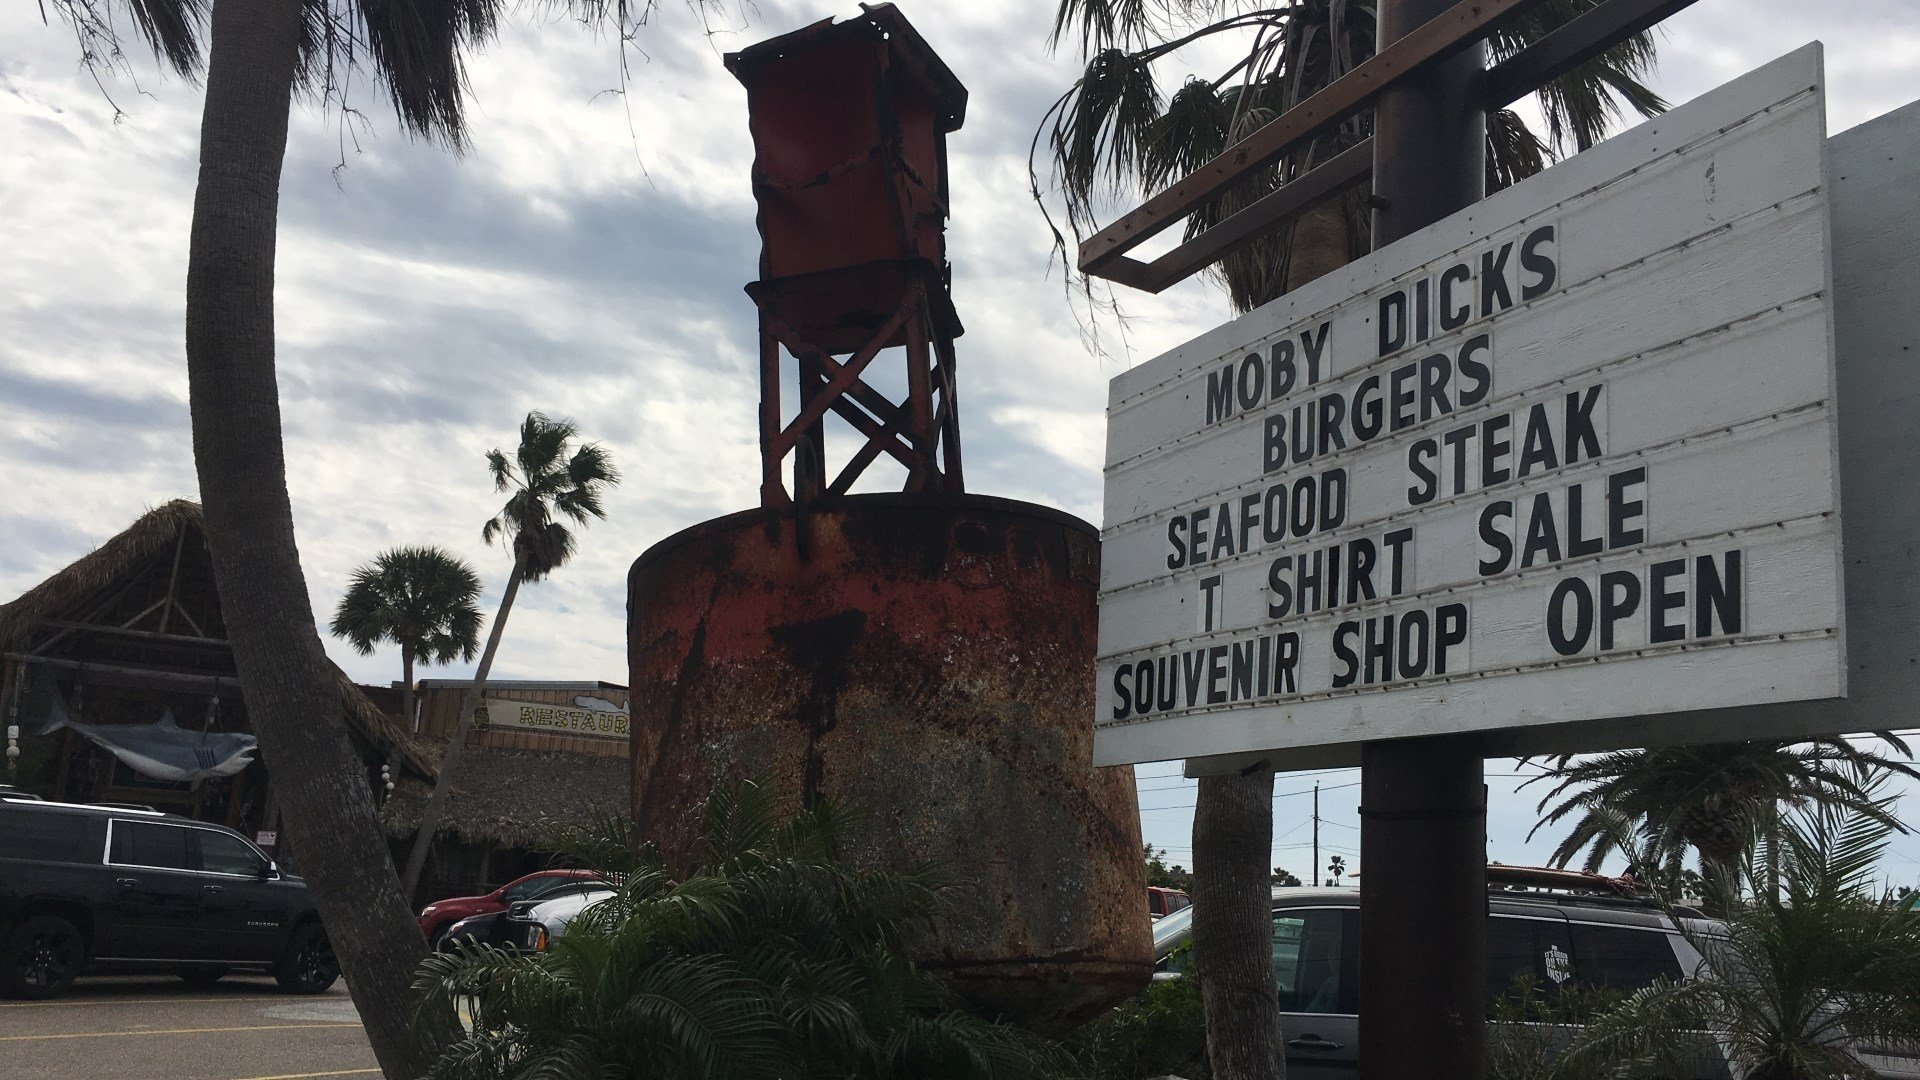 Photo Moby Dick's restaurant in Port Aransas 3-23-2018